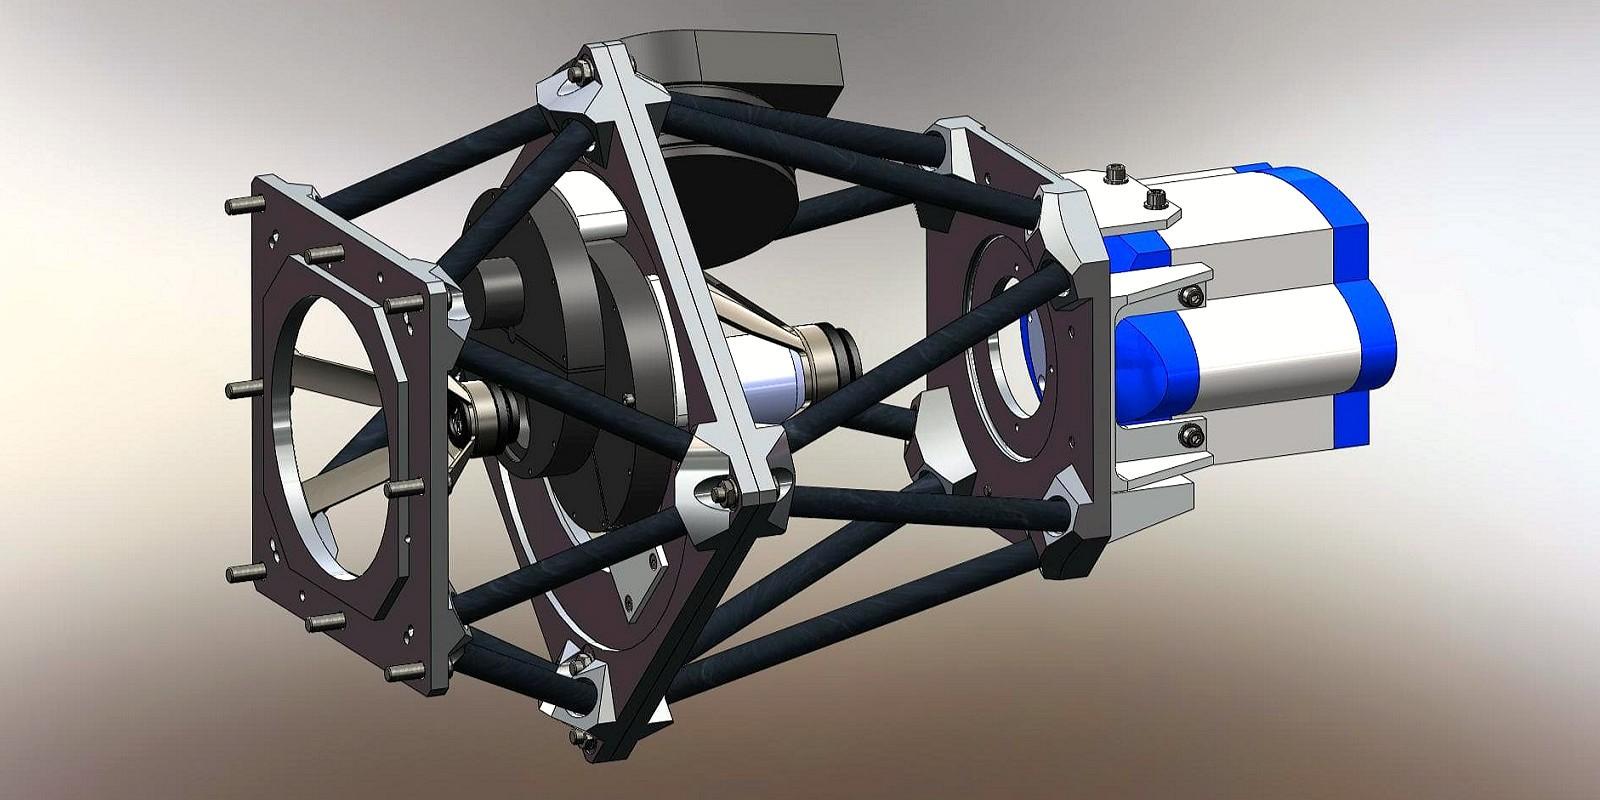 Fastcam_astronomy_instruments_Canary_Islands_IDOM_ADA_4__1